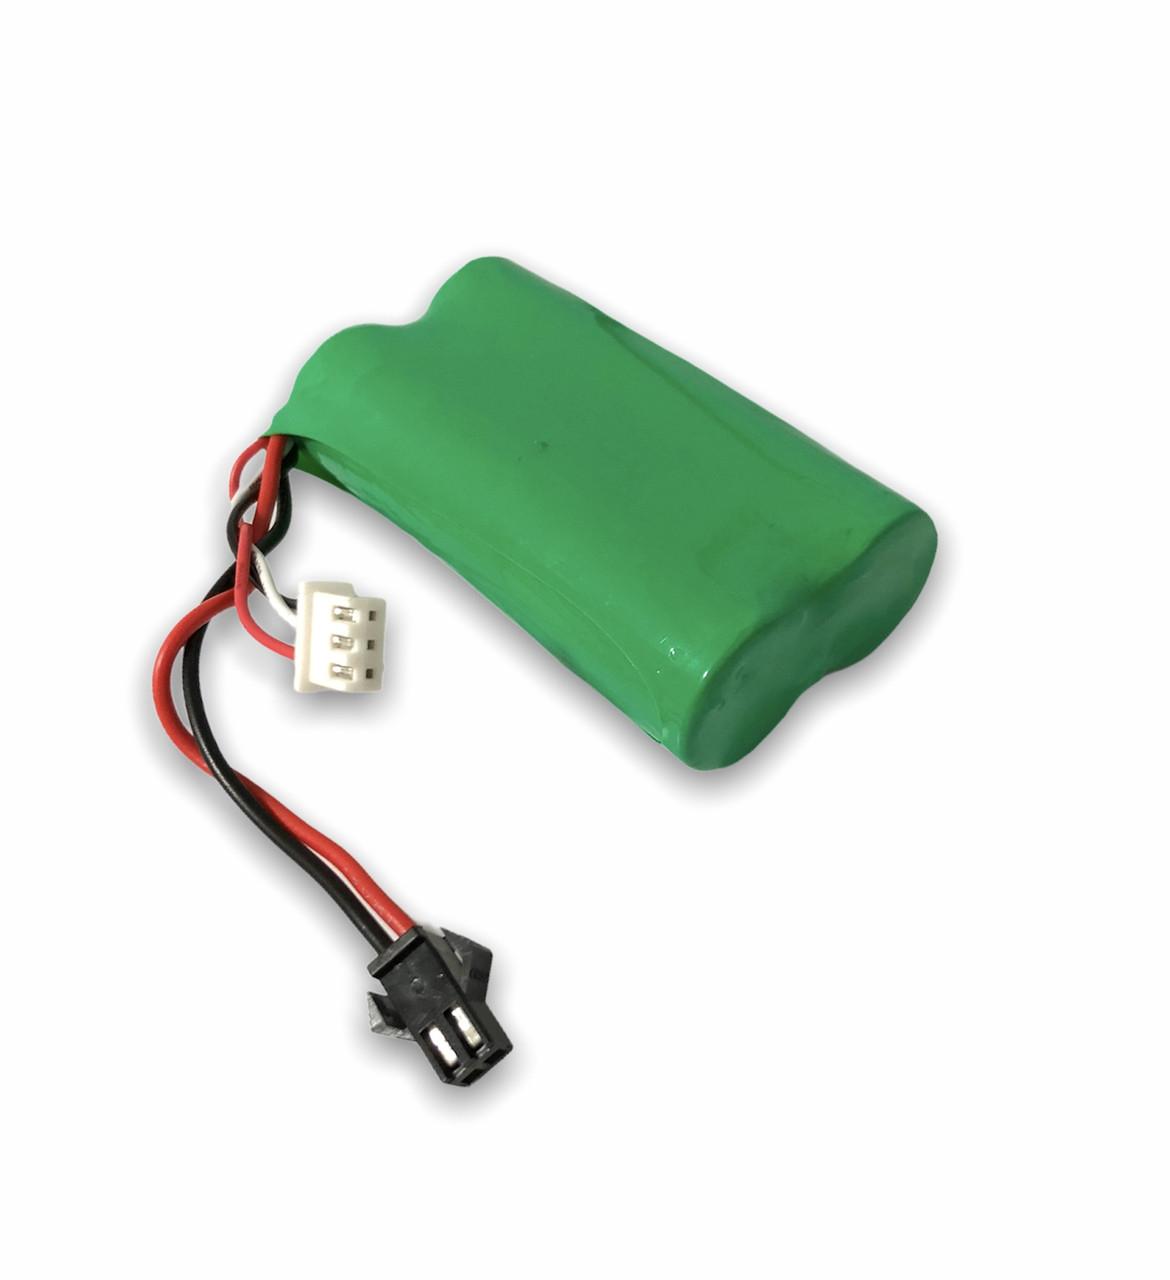 Аккумулятор 7.4В 3000 Li ion А до дитячих игрушек